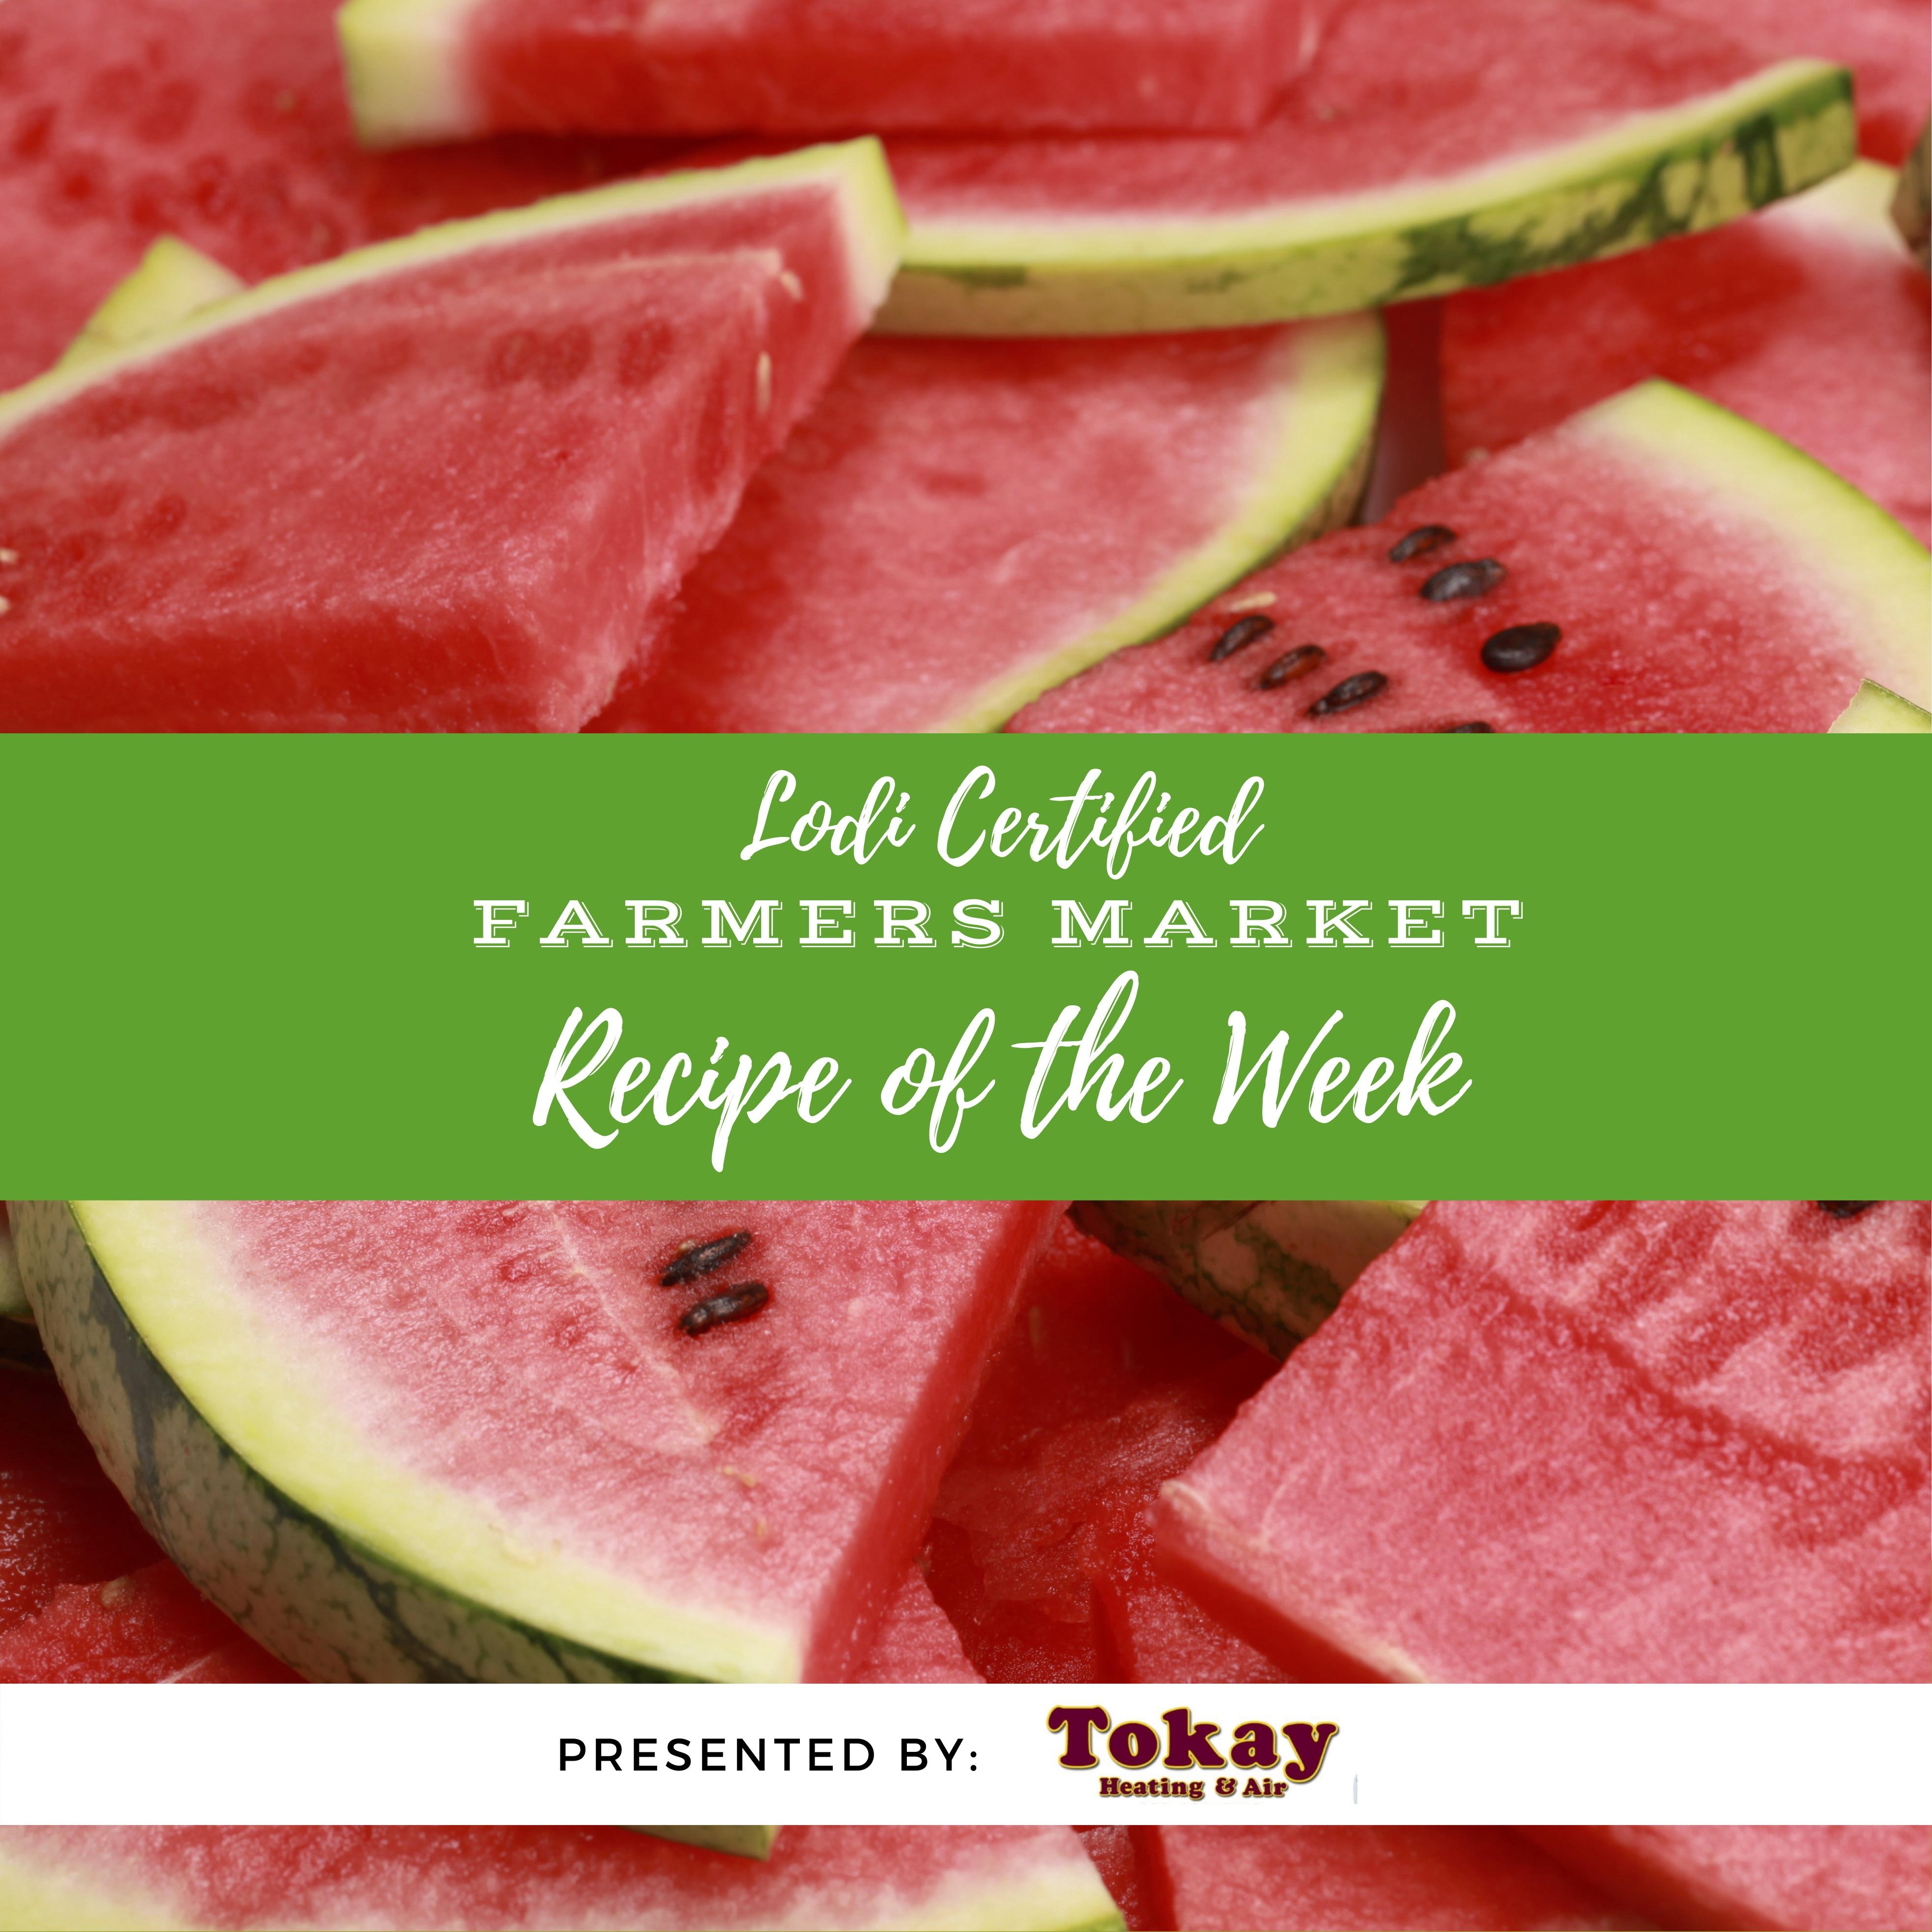 Recipe of the Week - Watermelon Strawberry Caprese Salad